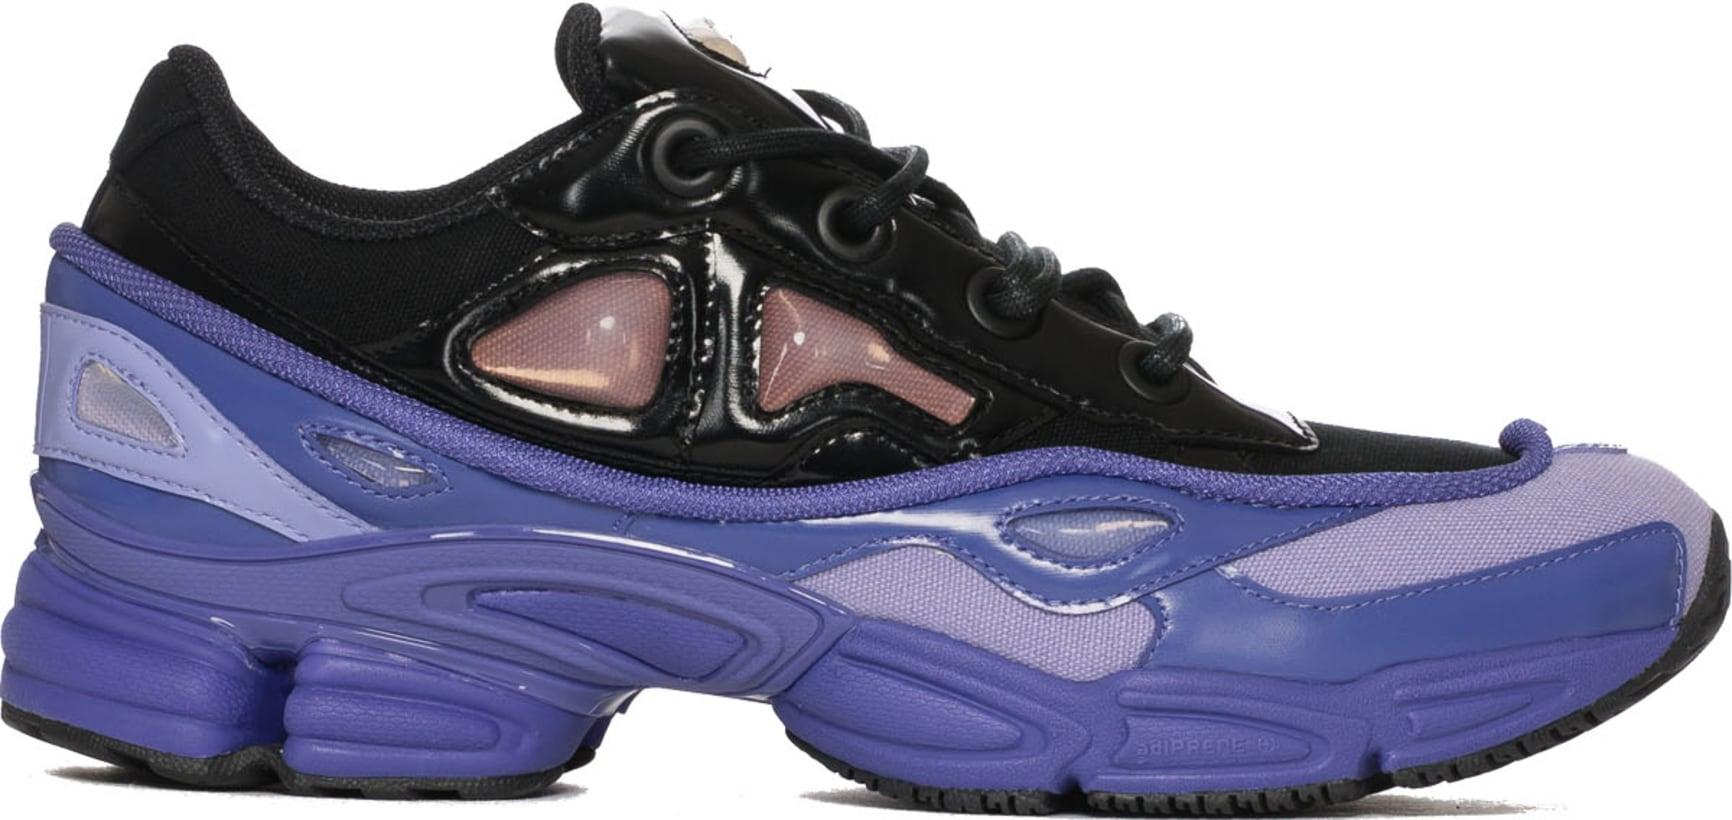 adidas by Raf Simons: Ozweego III